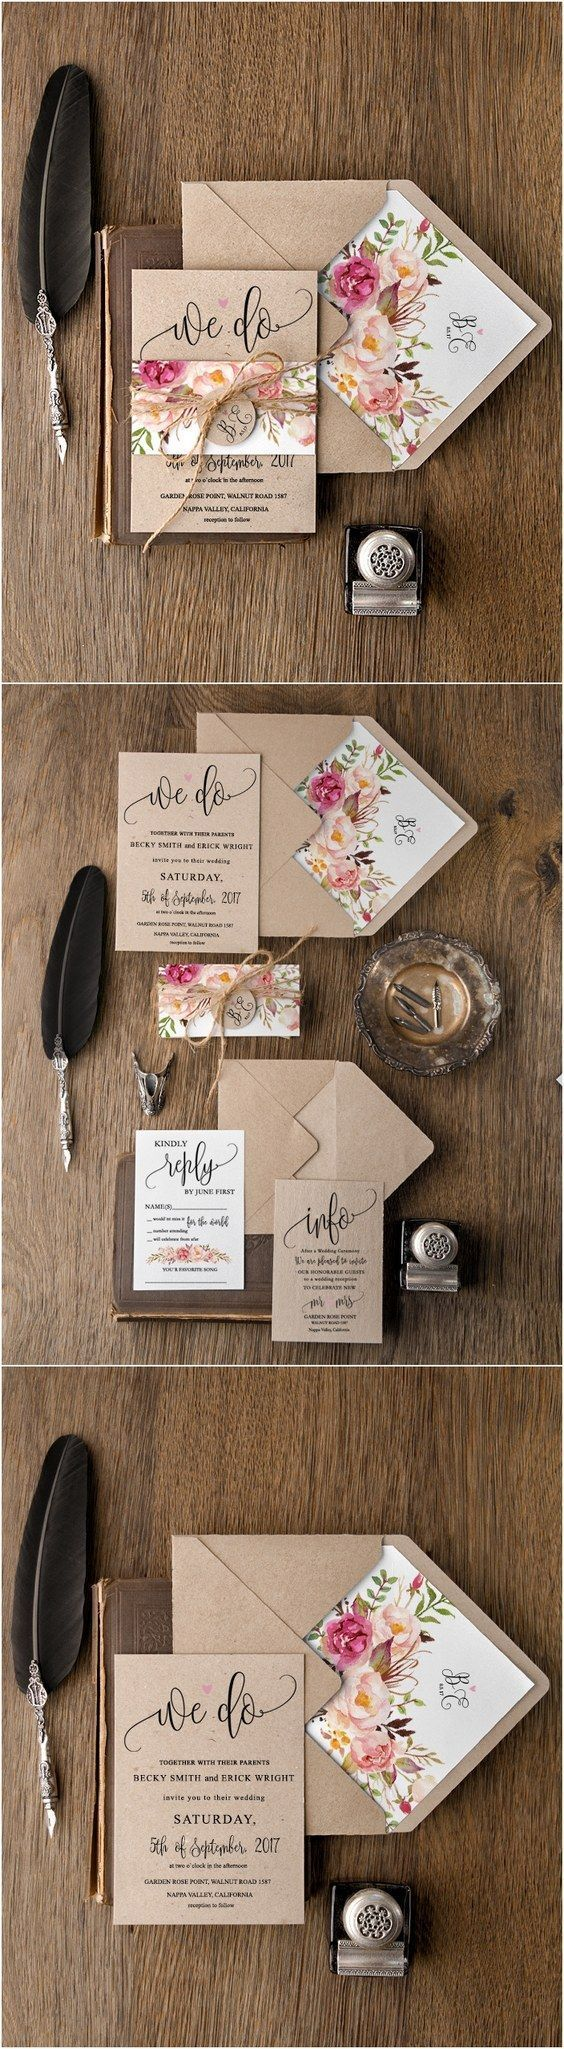 30 Best Tarjetas Images On Pinterest Card Wedding Wedding Ideas